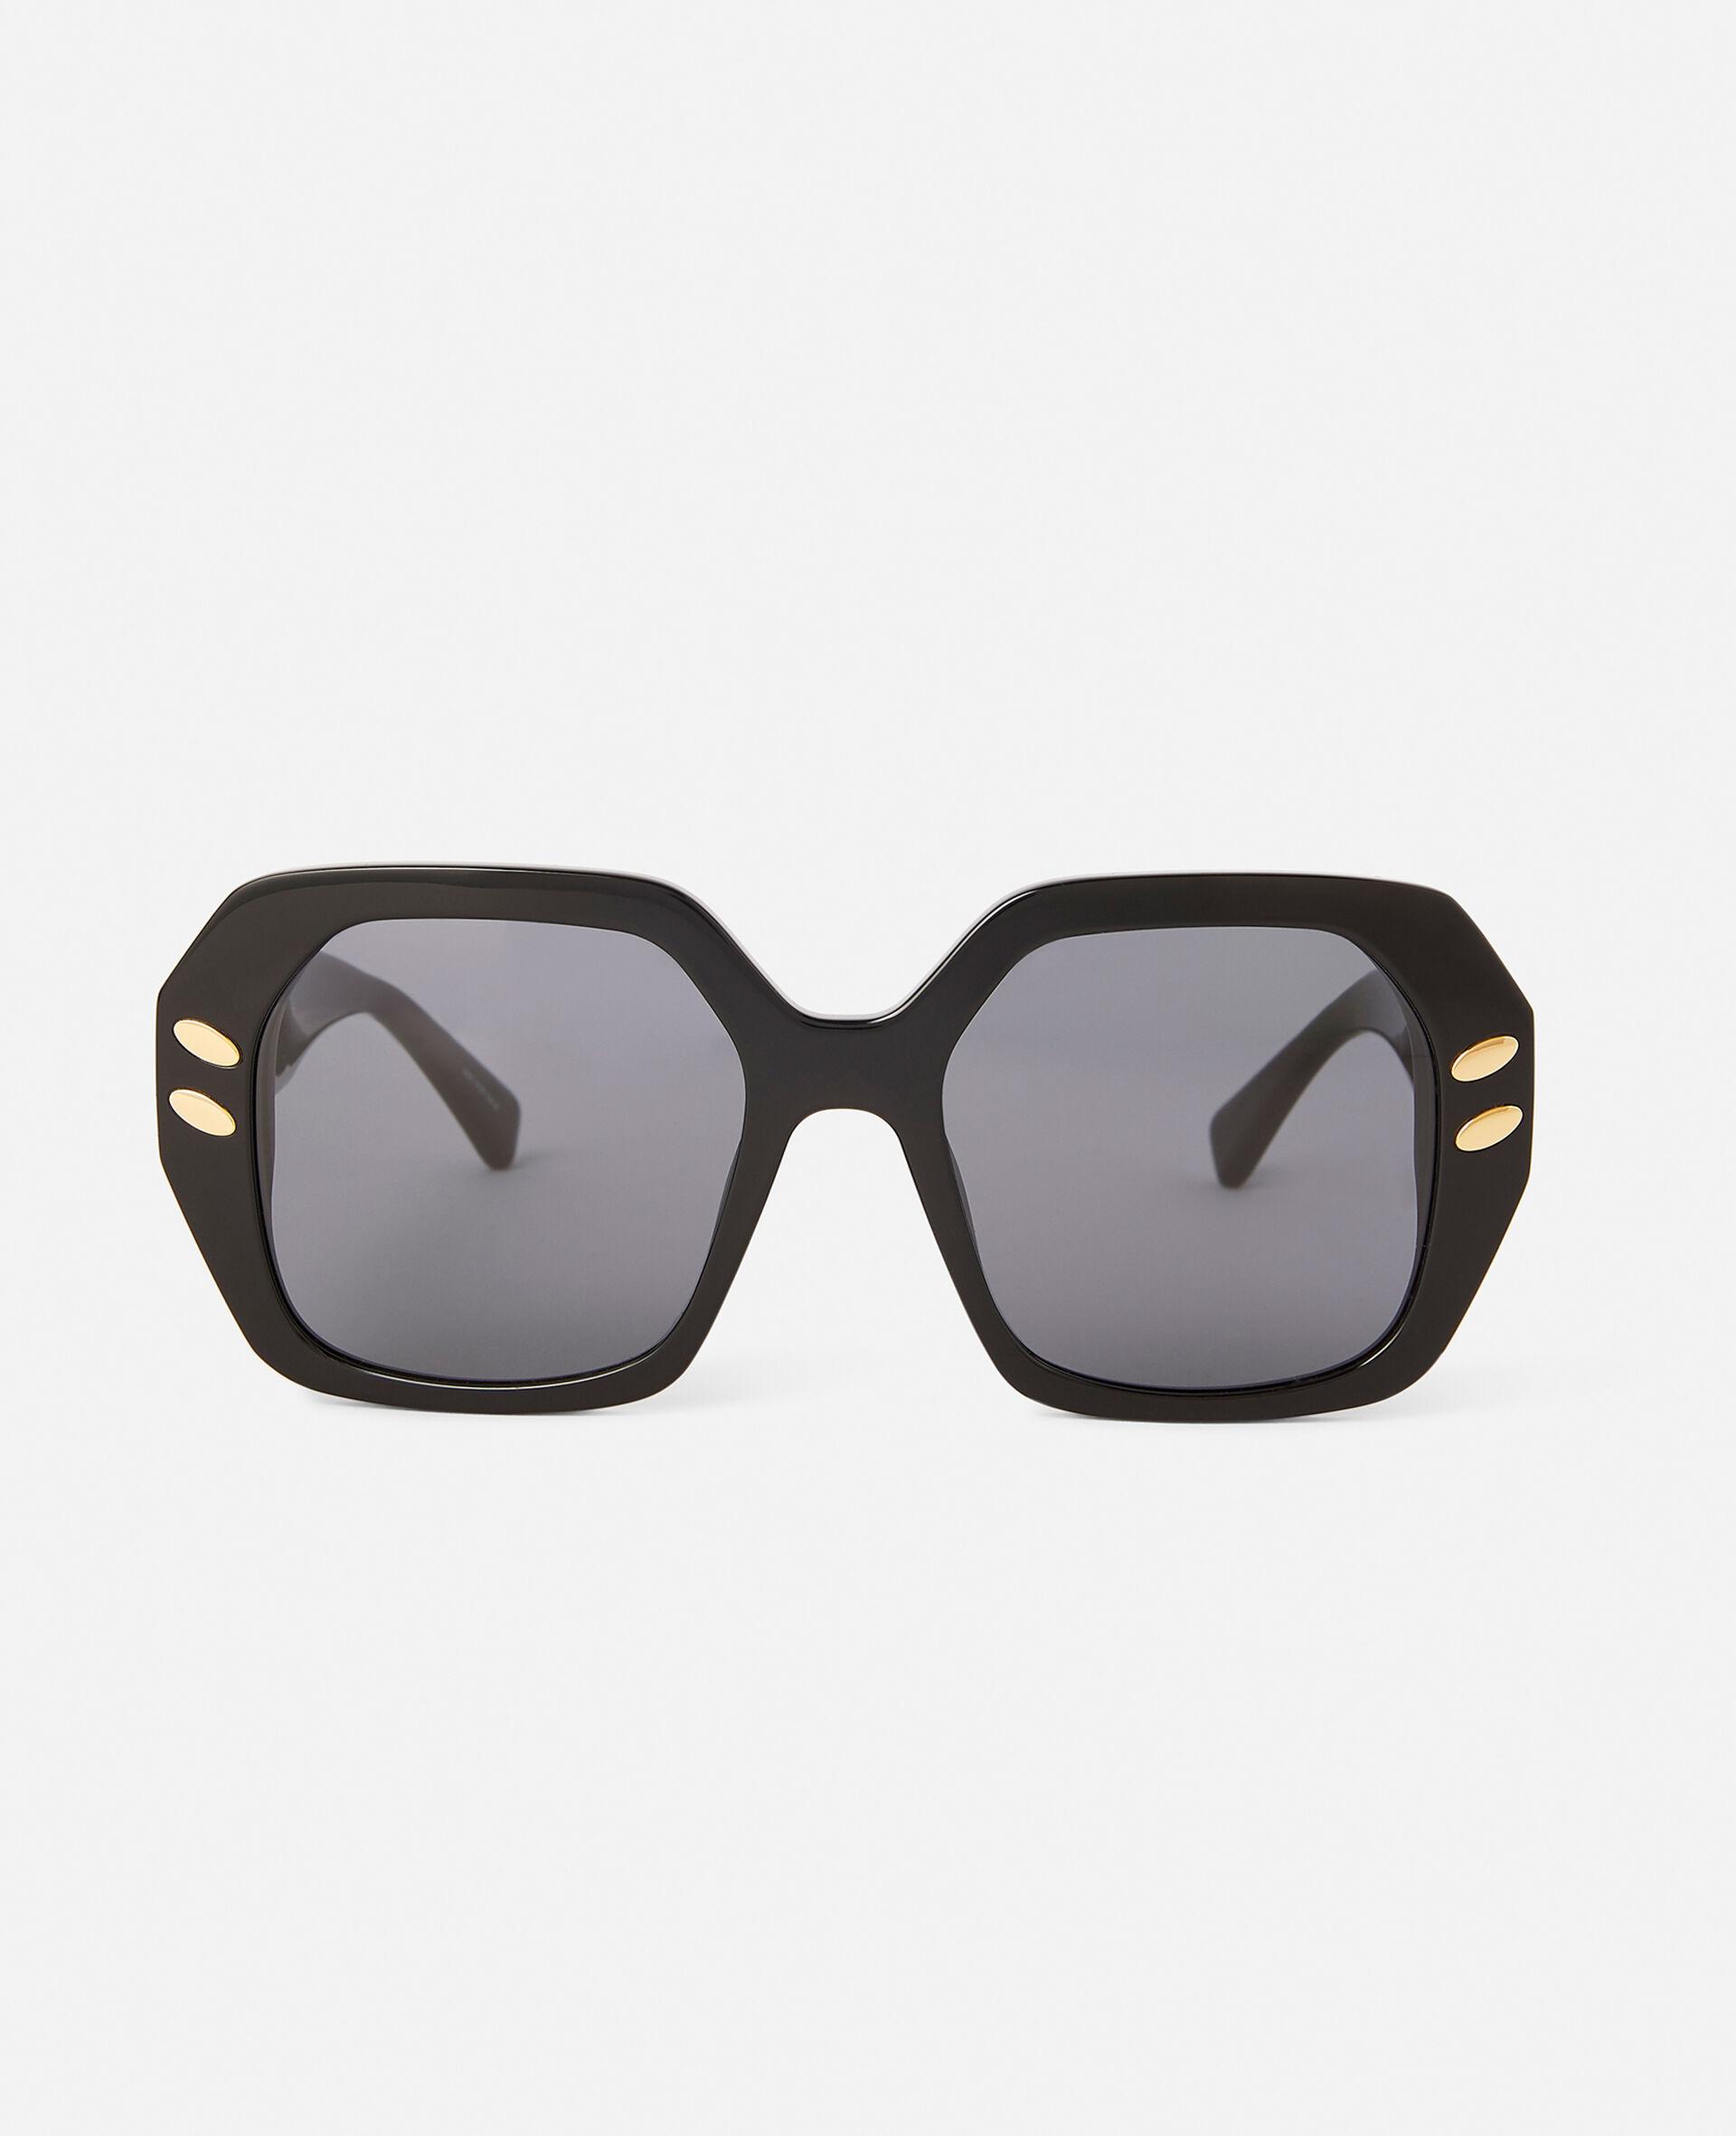 Brown Geometric Sunglasses-Brown-large image number 2